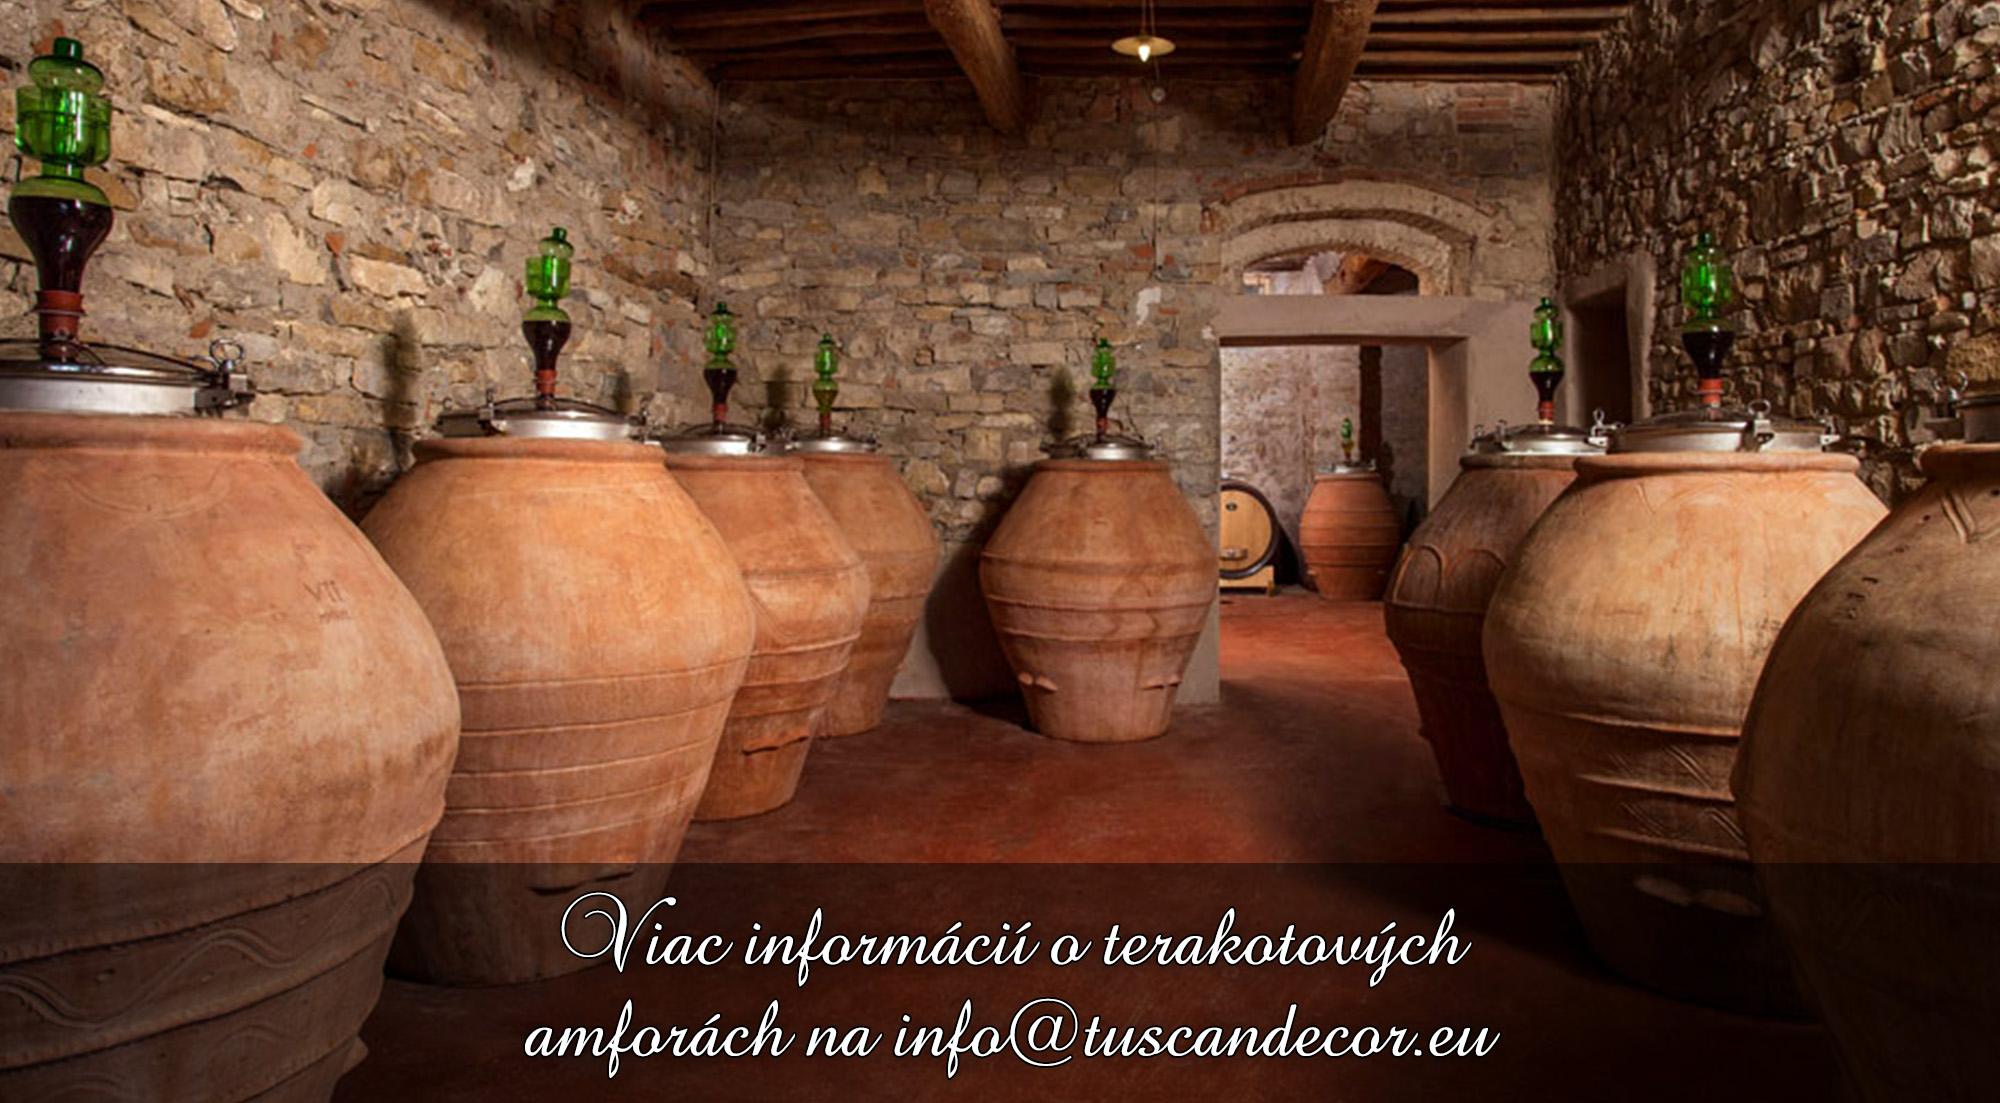 tuscan-decor-slide-6